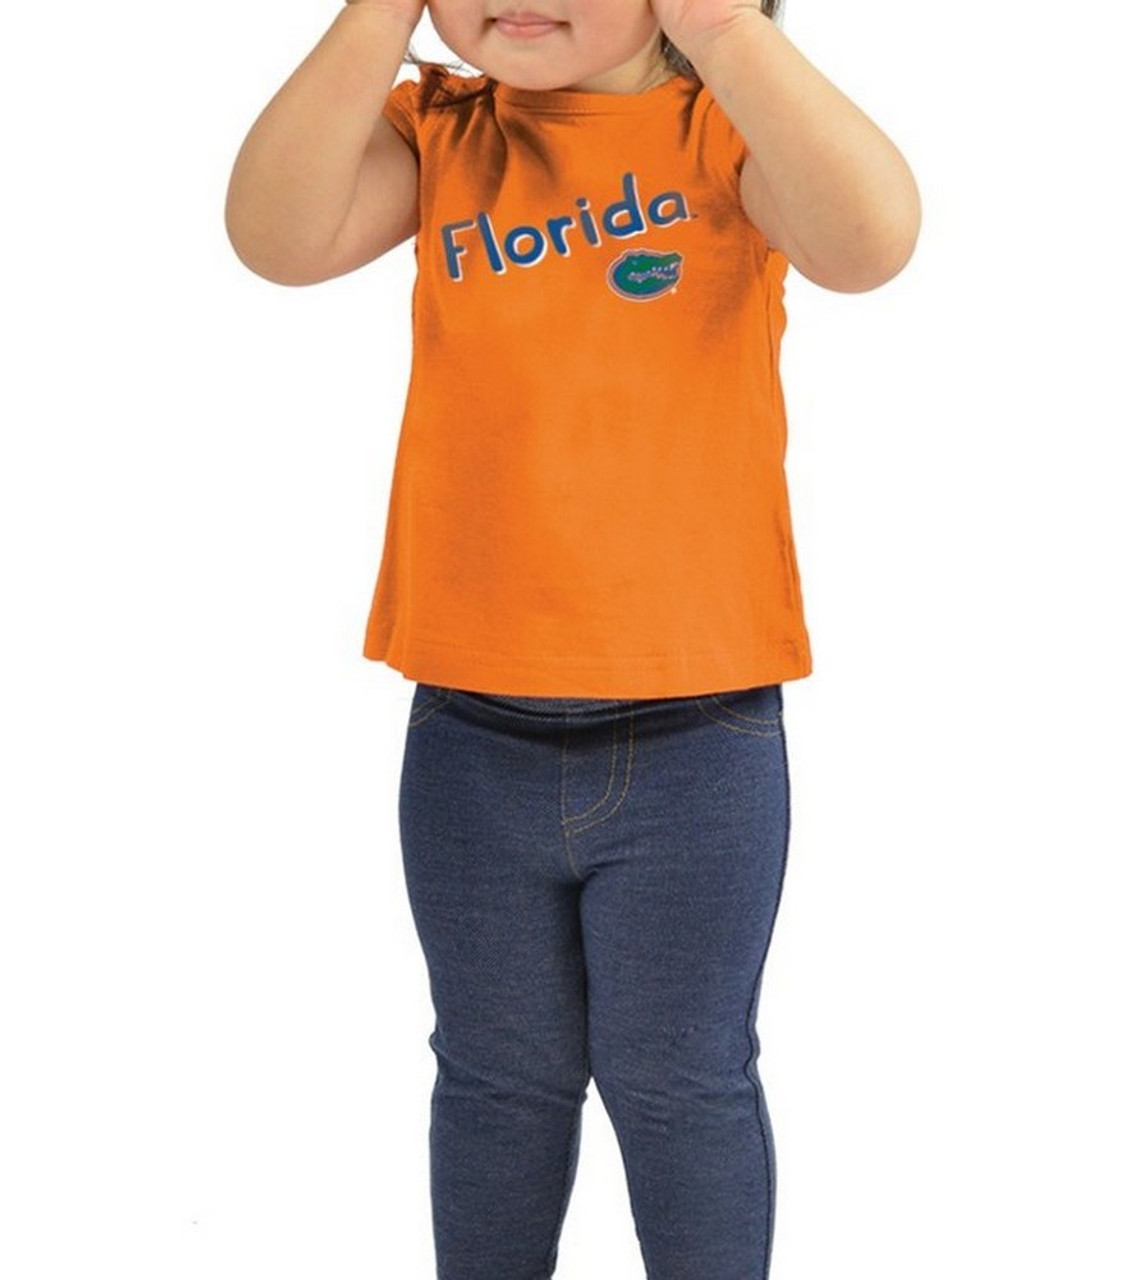 Arkansas Razorback Girls' Tee Shirt and Jeggings Set